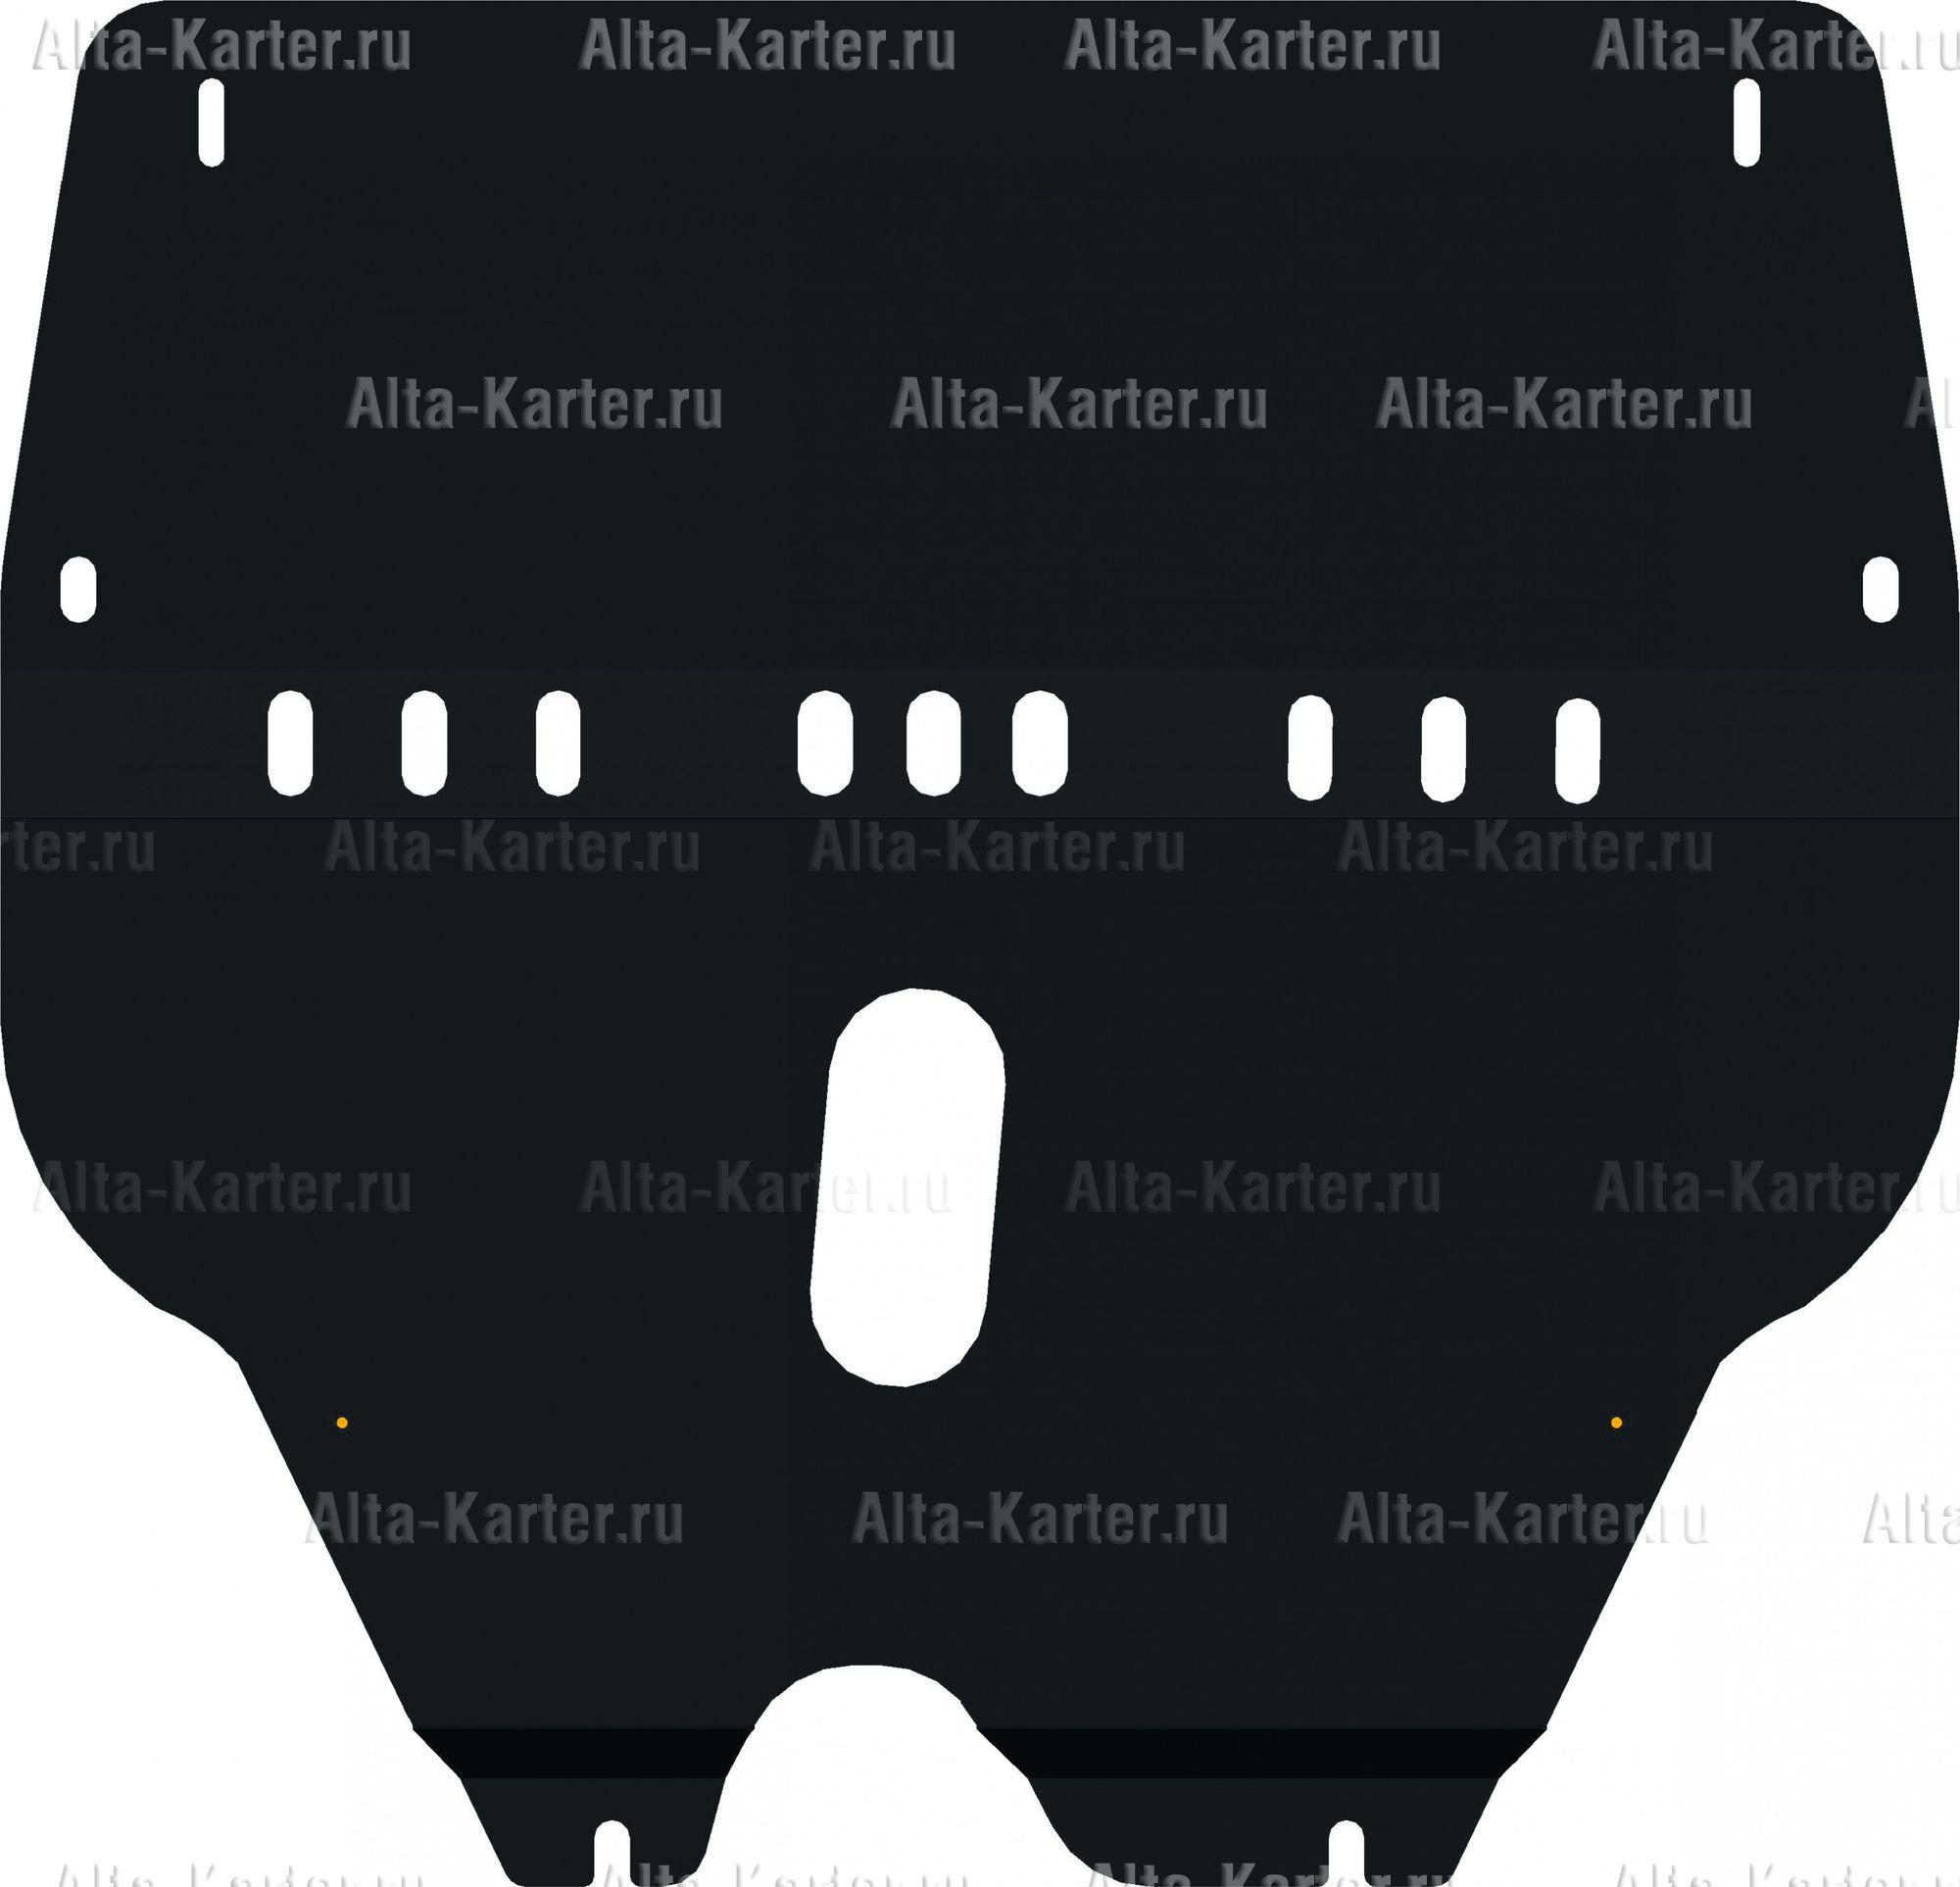 Защита Alfeco для картера и КПП Skoda Roomster 2006-2015. Артикул ALF.20.01